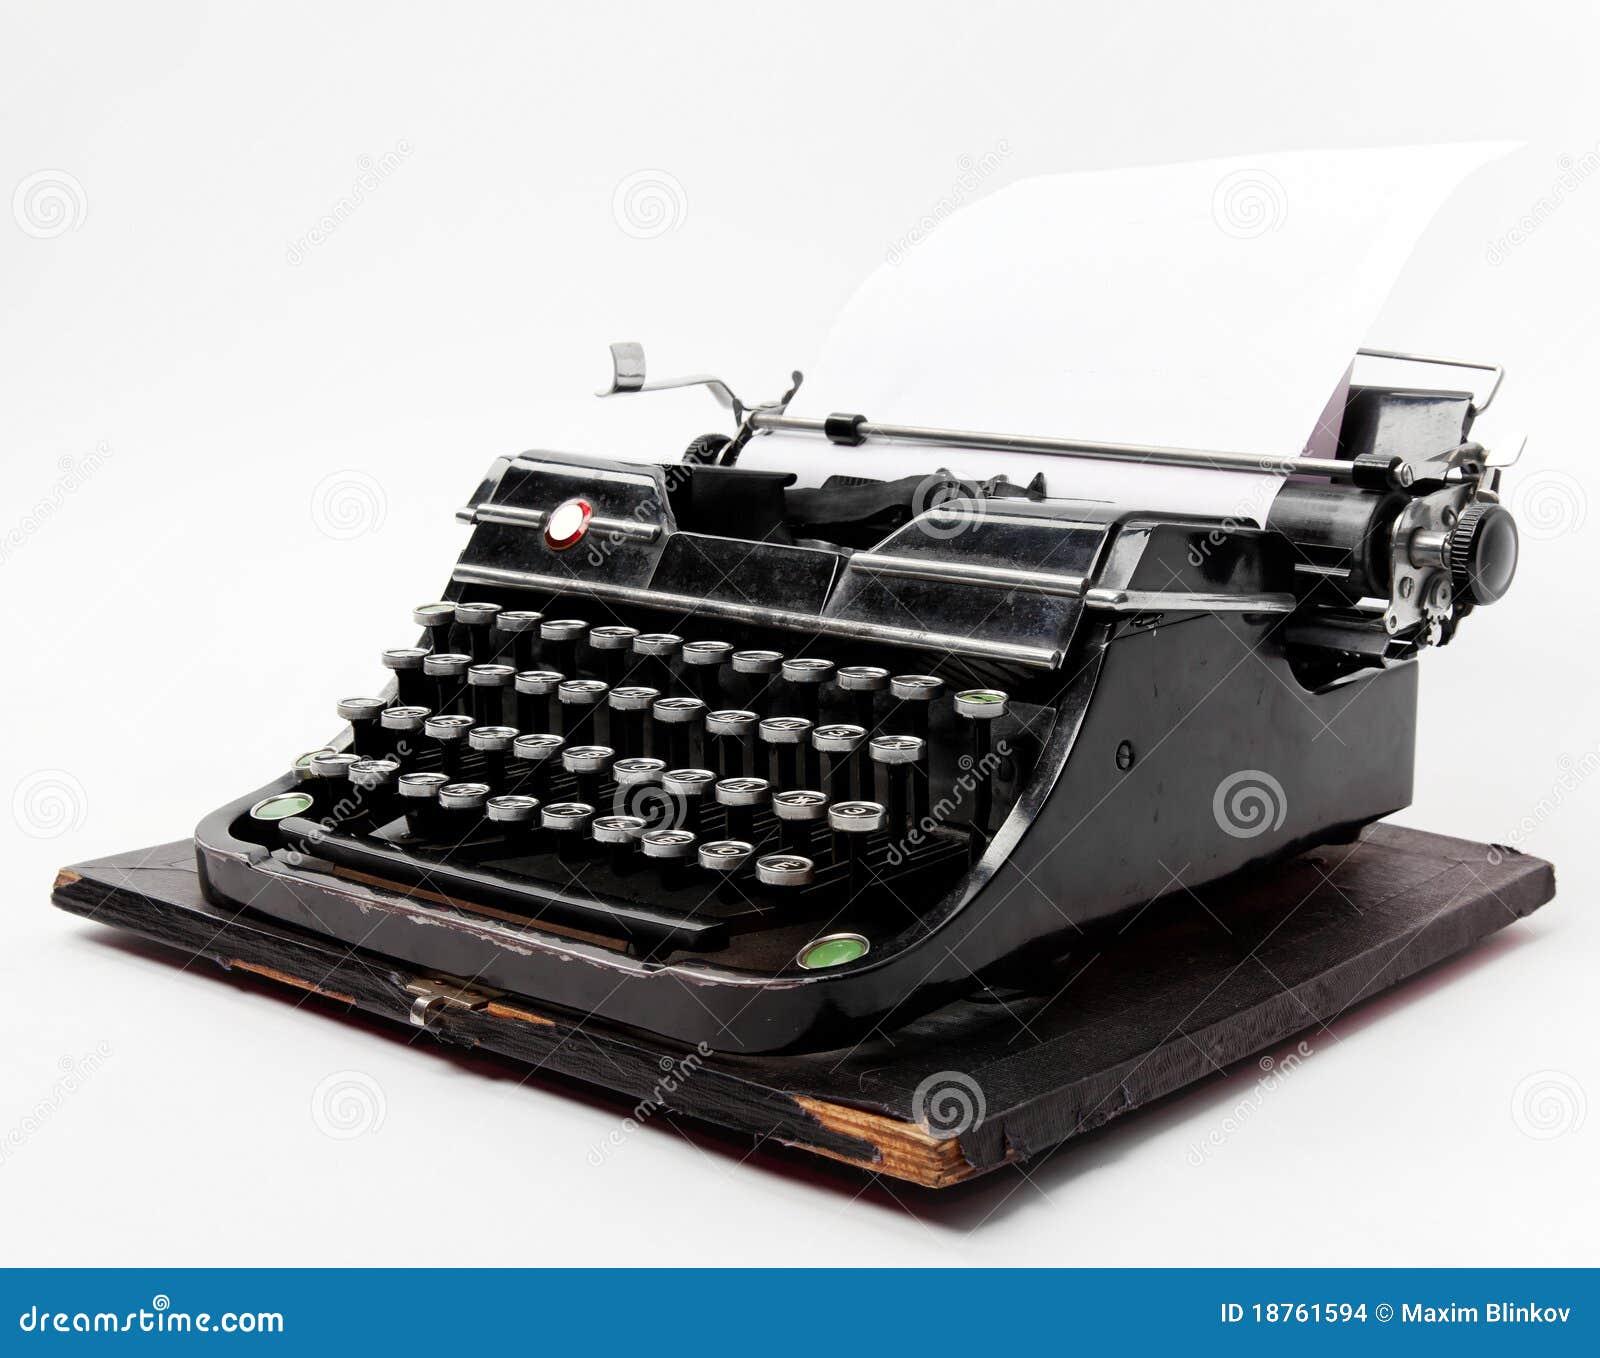 typewriter paper Amazoncouk: typewriter paper i sticky notes pop-up dispenser i funny paper notes dispenser i note pad with box i retro i sticky paper notes i typewriter.